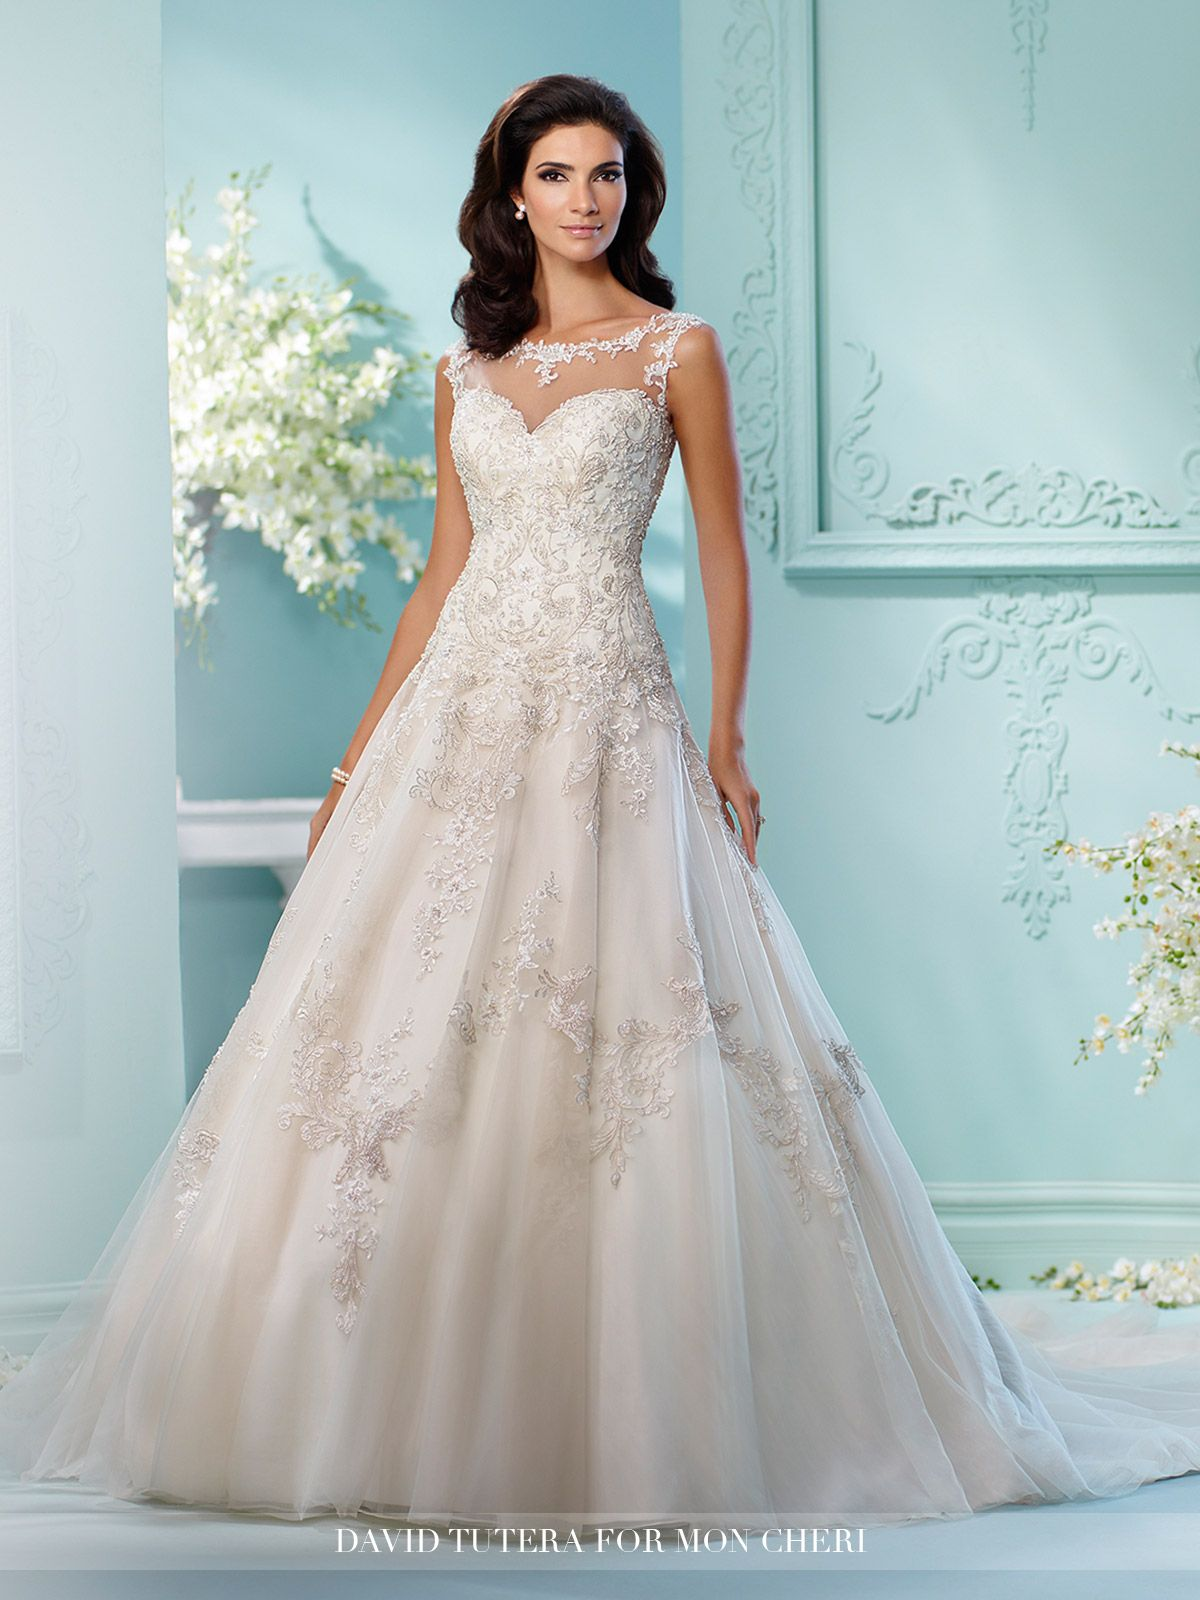 2018 Designer Wedding Dresses & Bridal Gowns | David tutera, Wedding ...